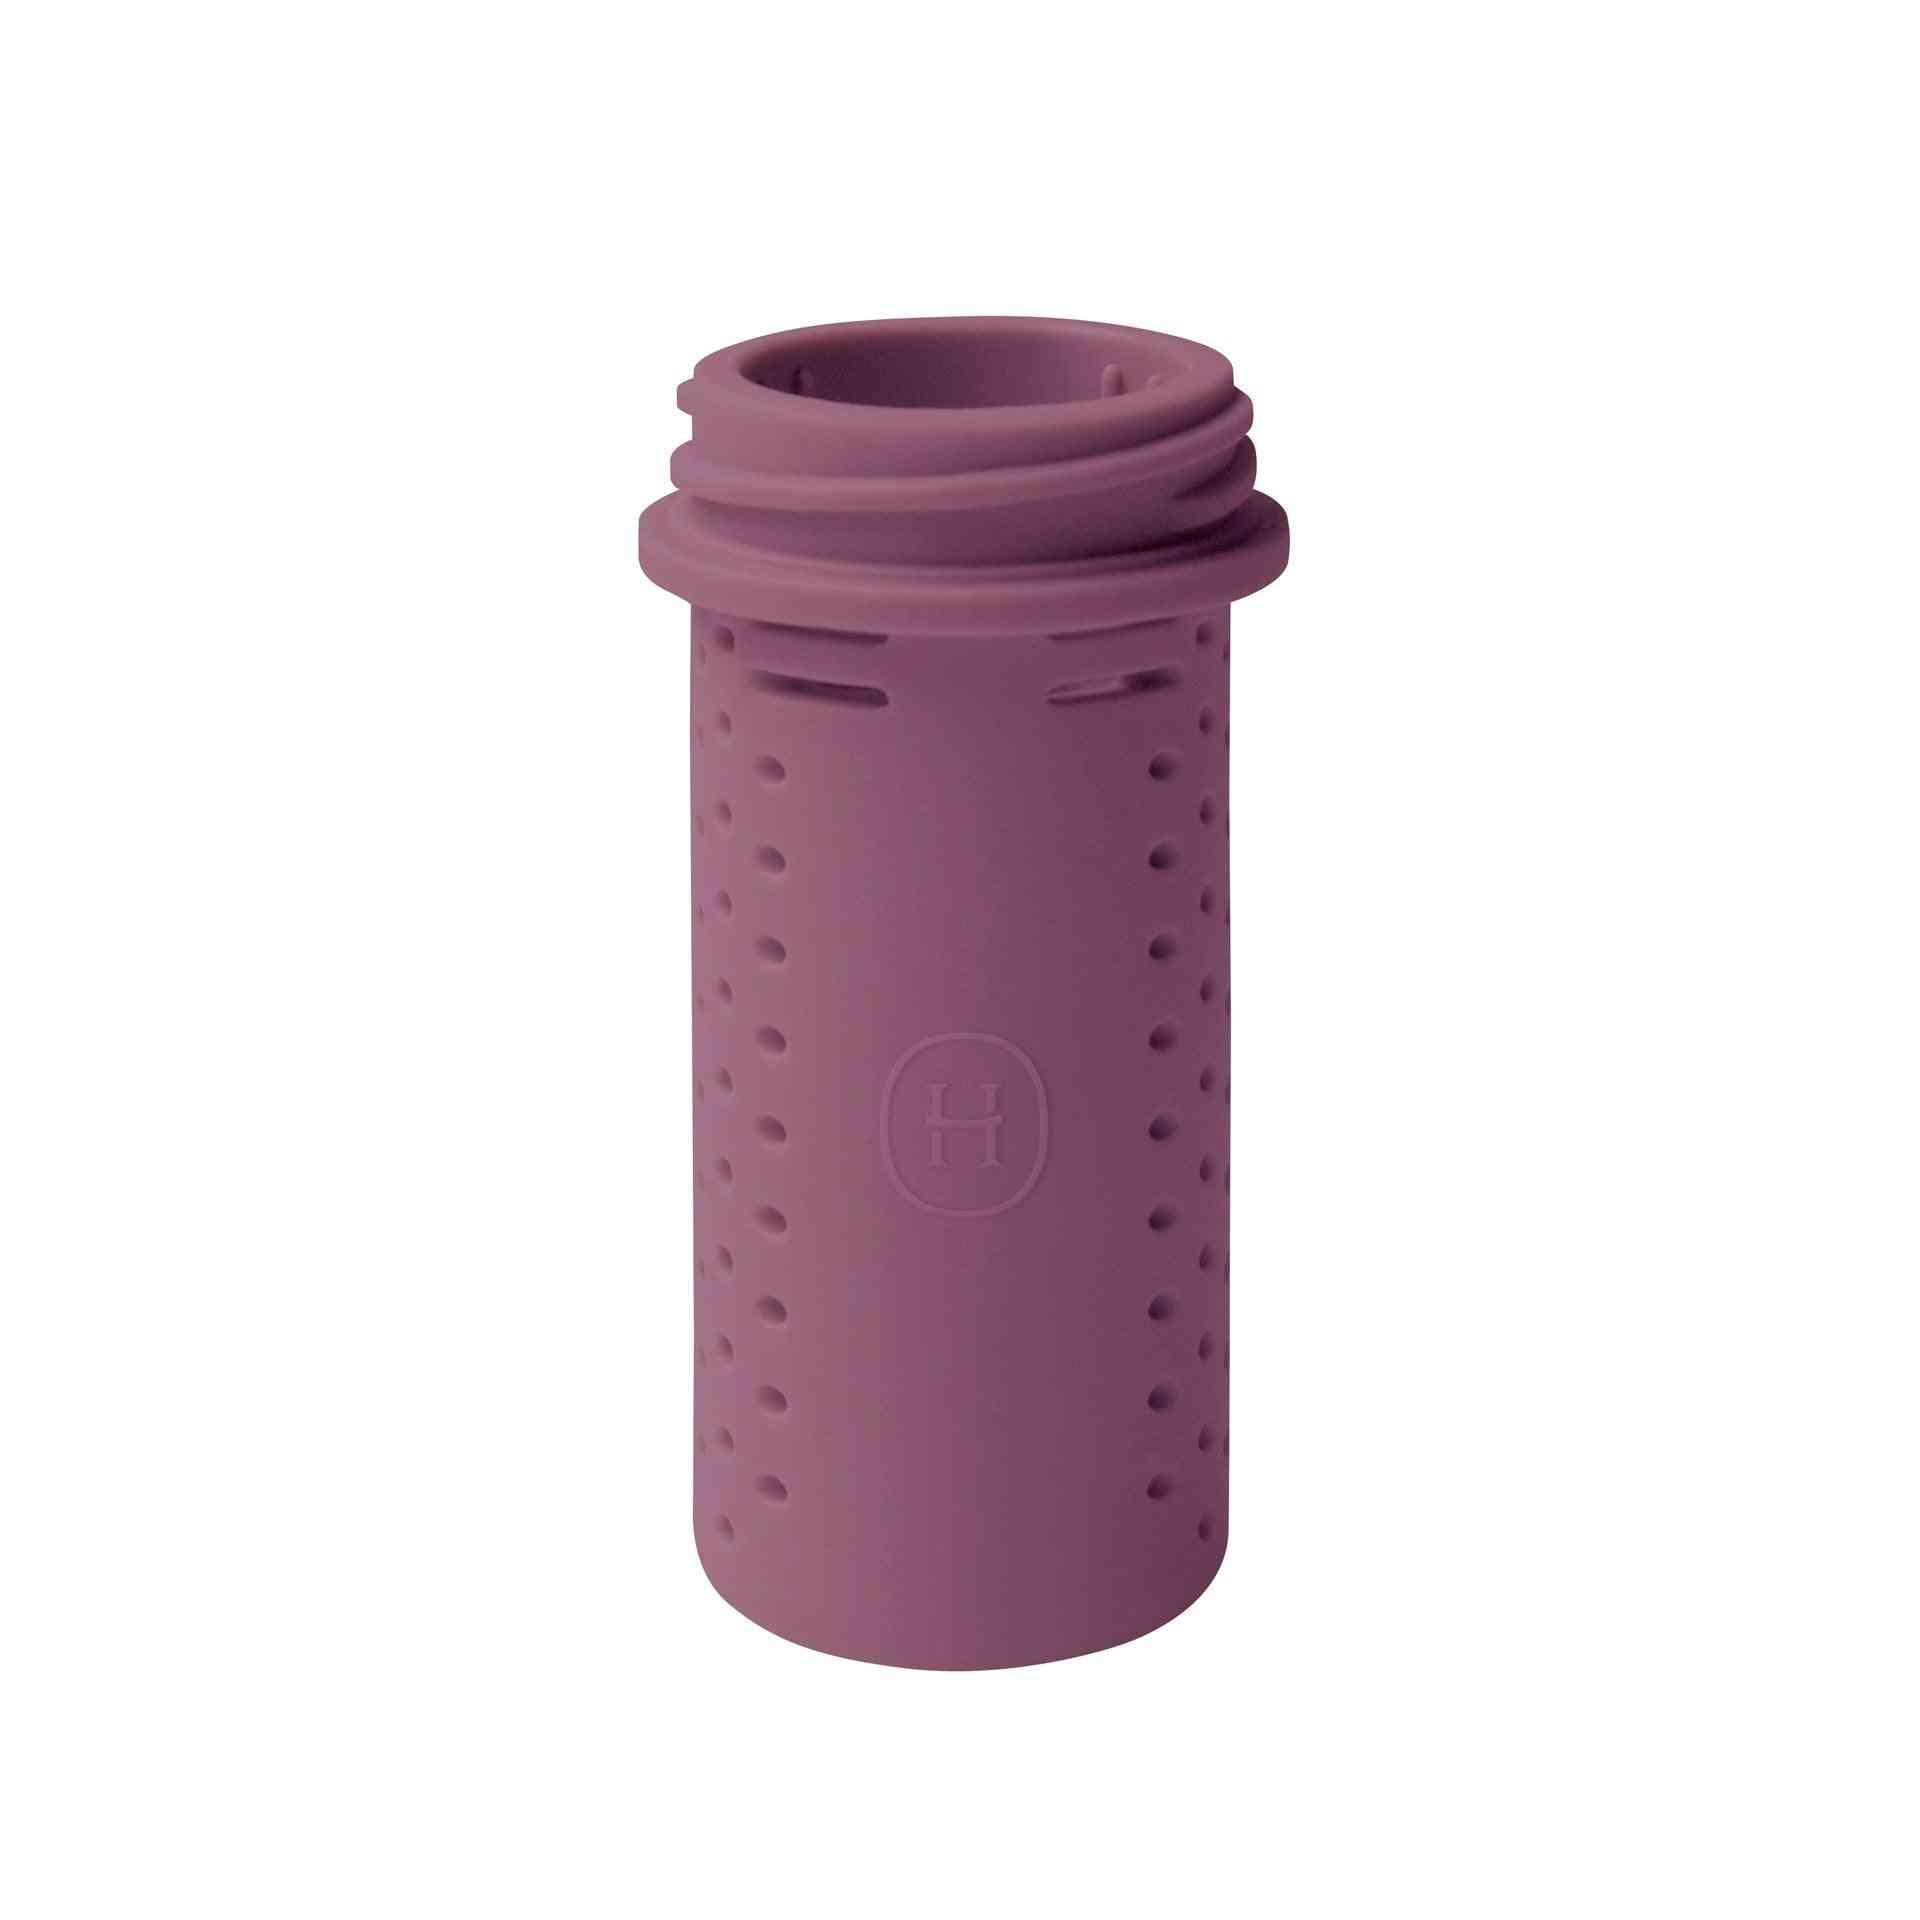 Purple Bottle Shaped Silicone Tea Infuser